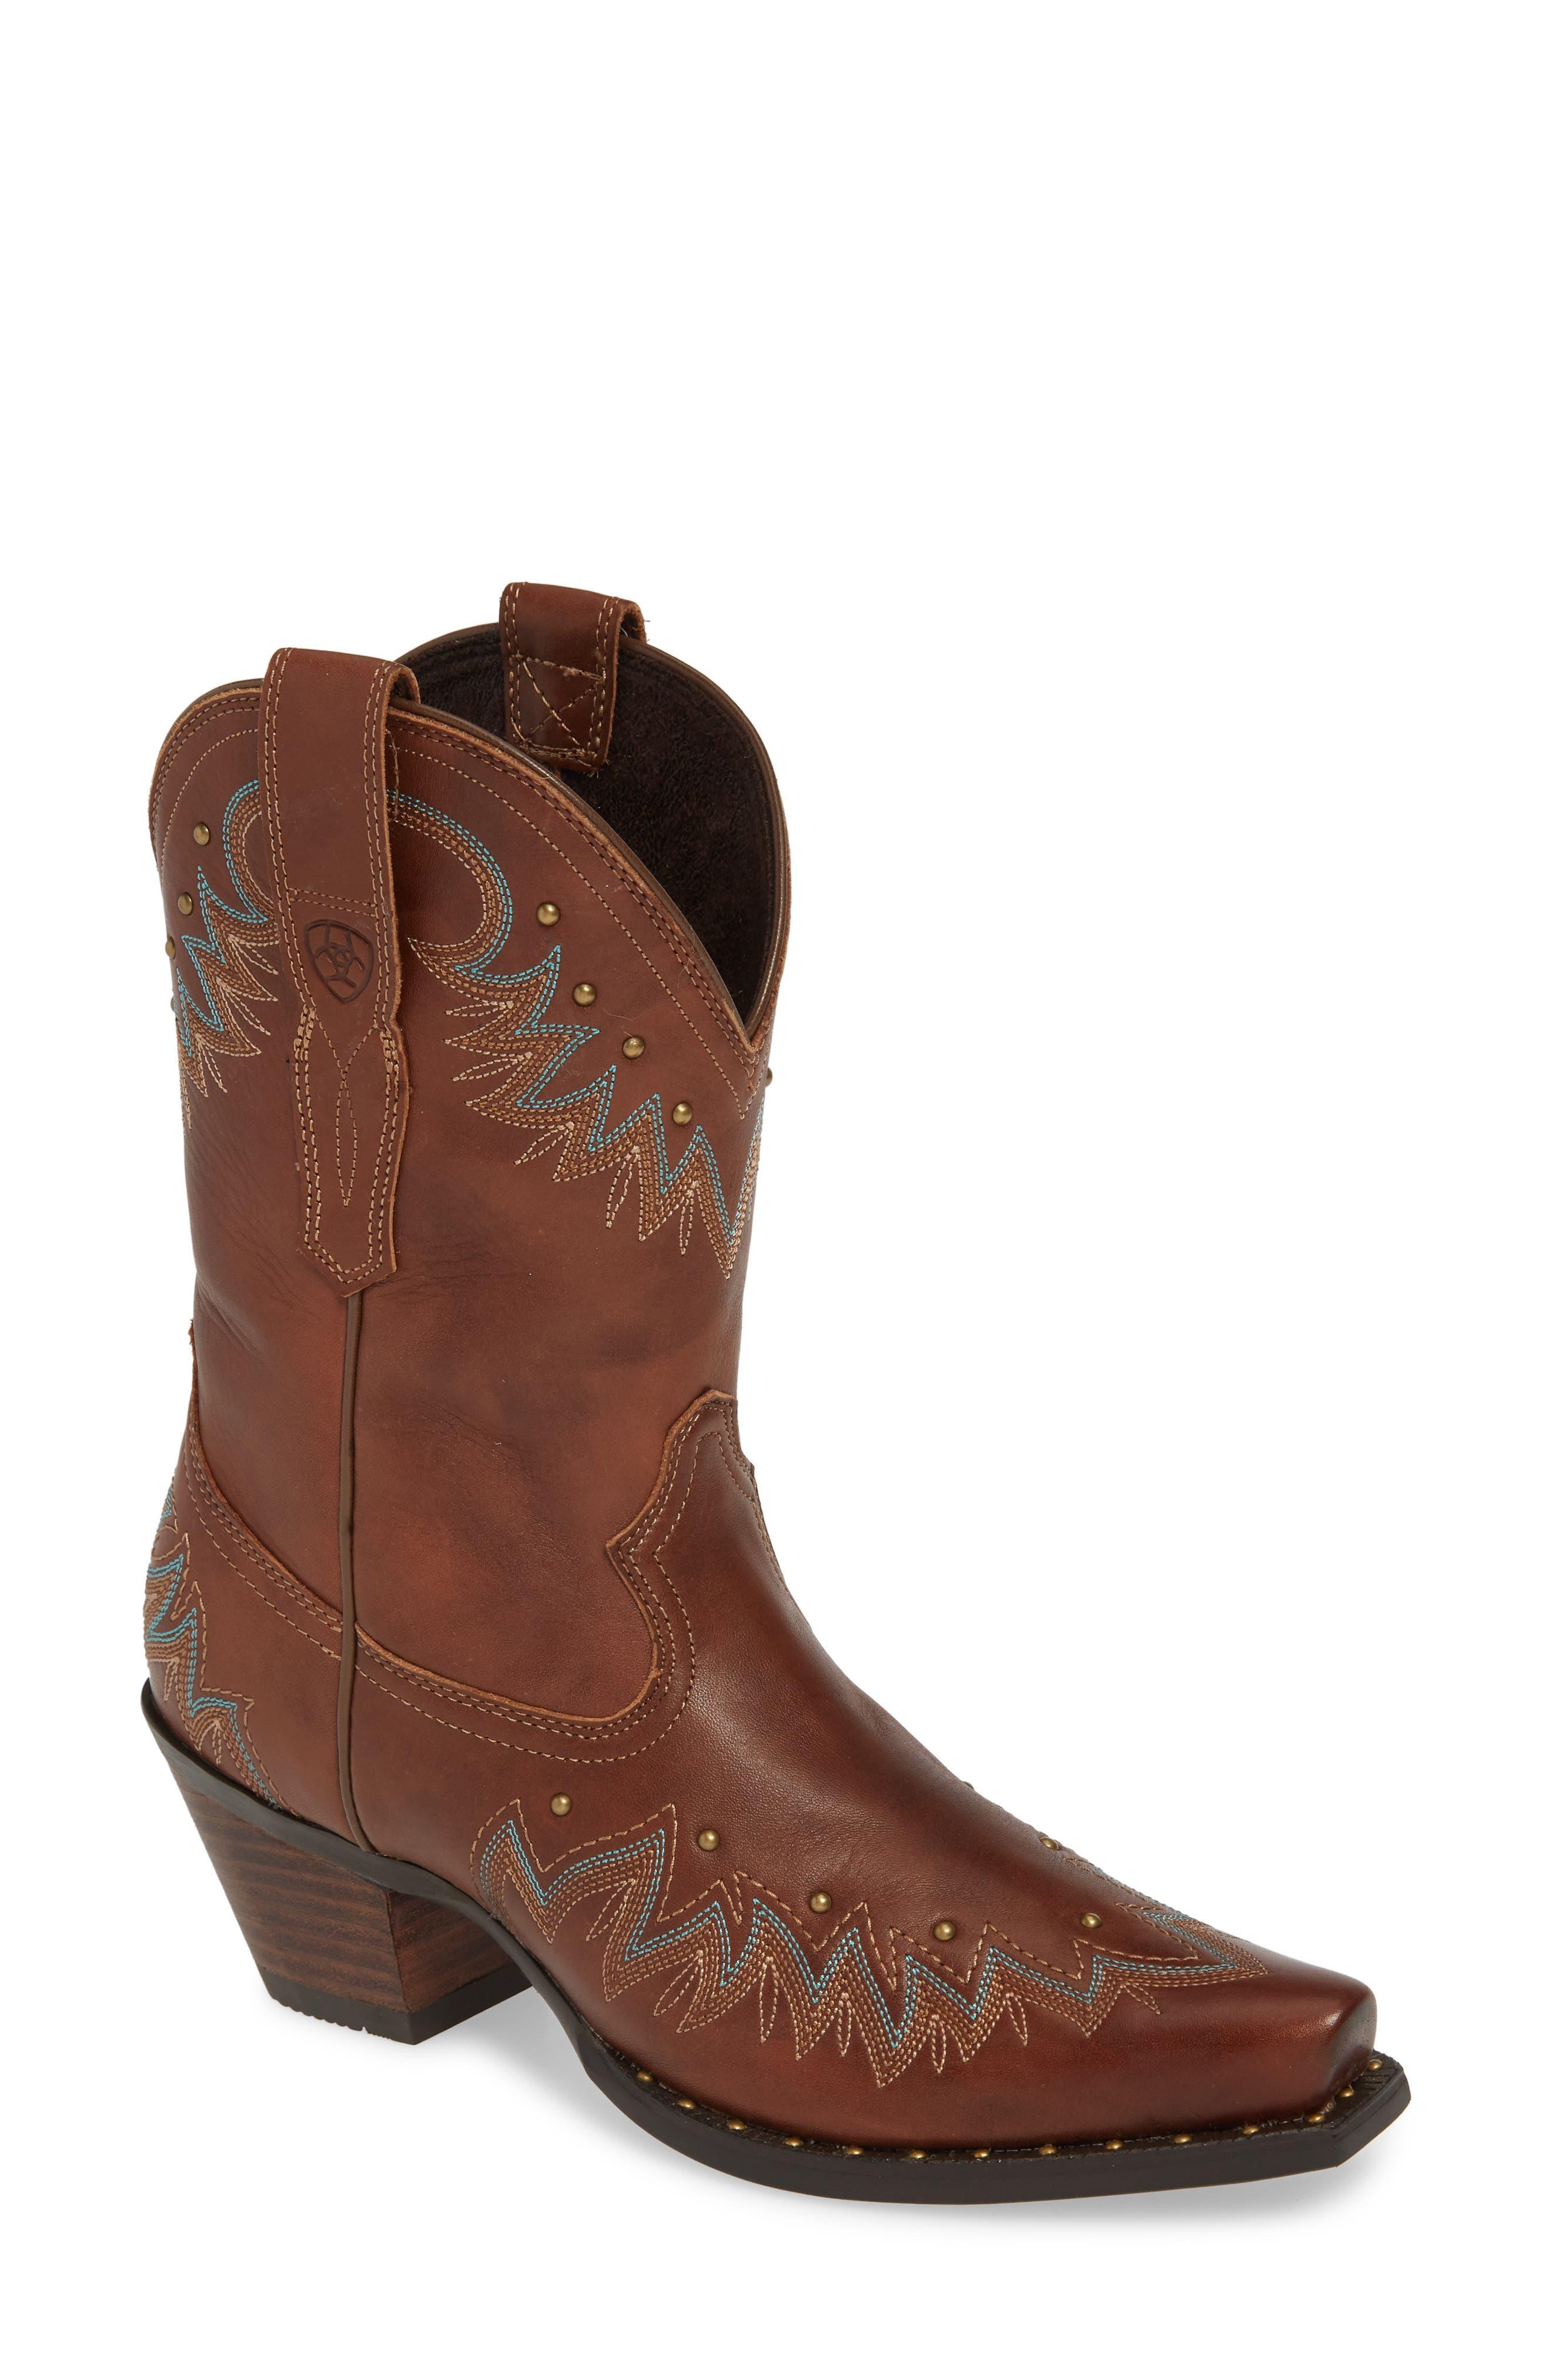 Ariat Potrero Western Boot, Black